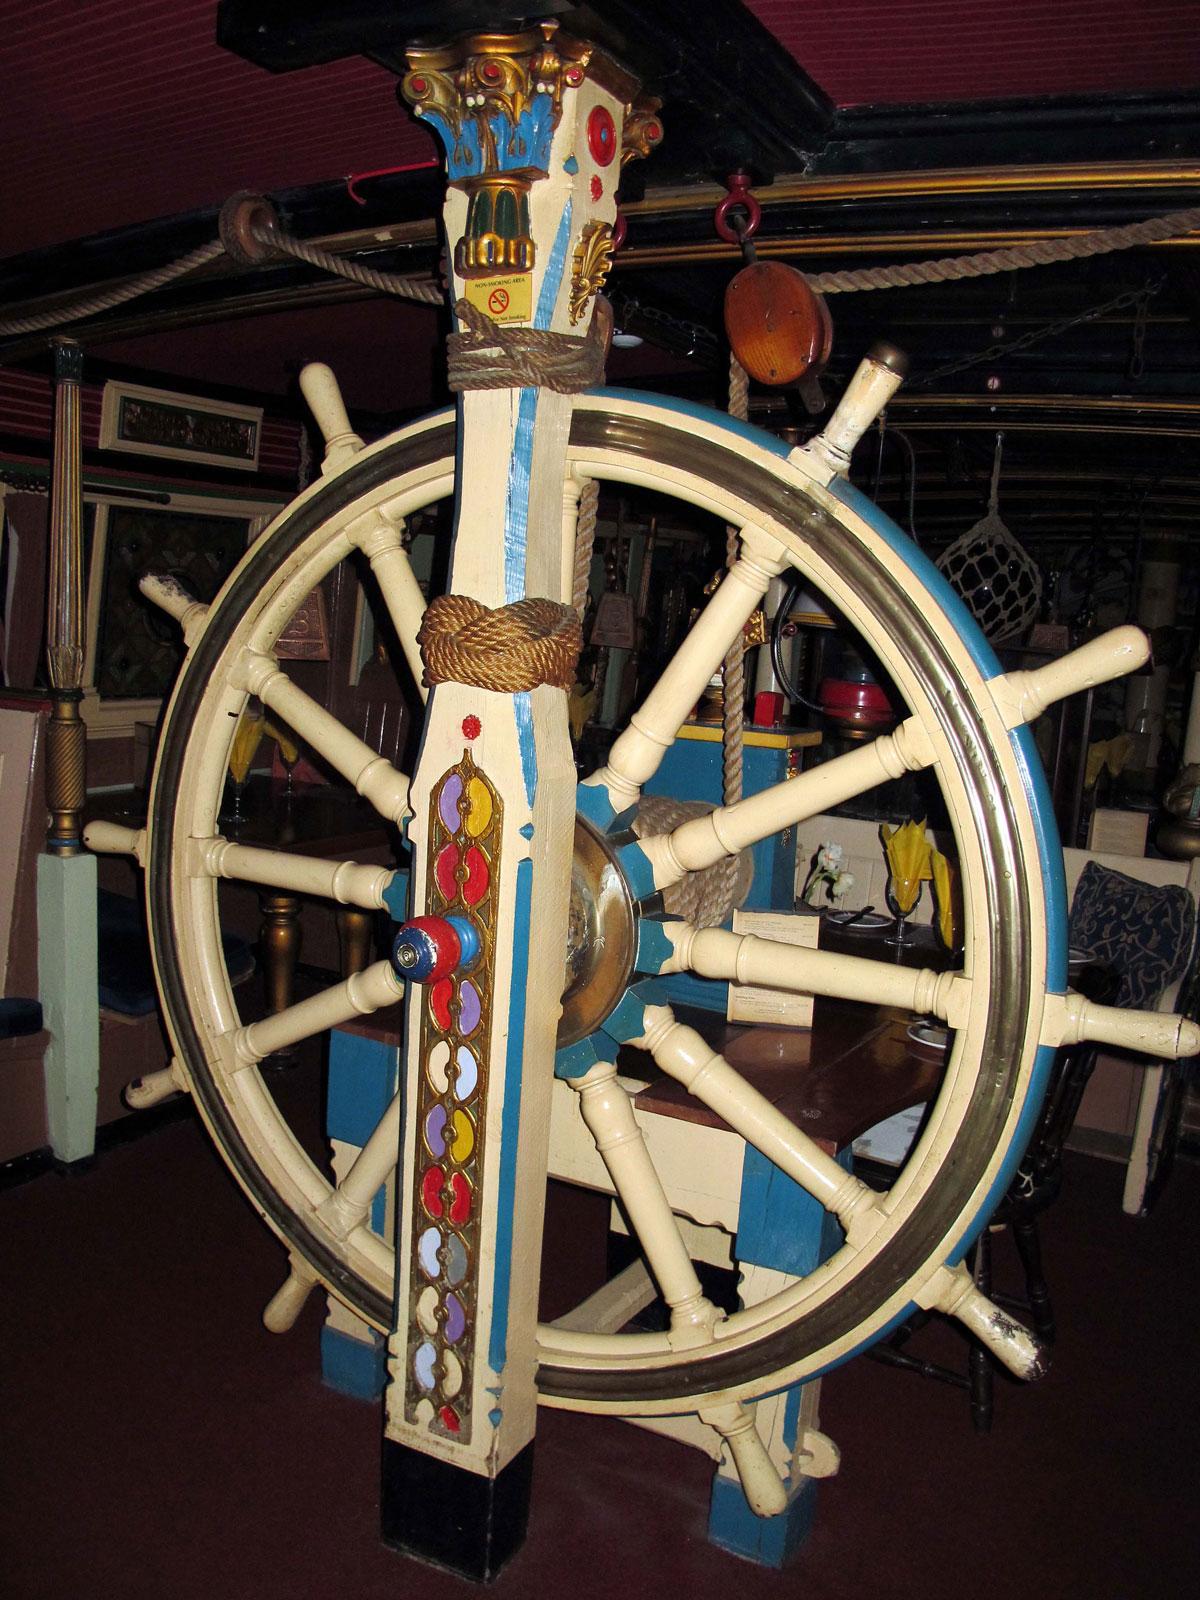 A Ship's Wheel inside the Benbow